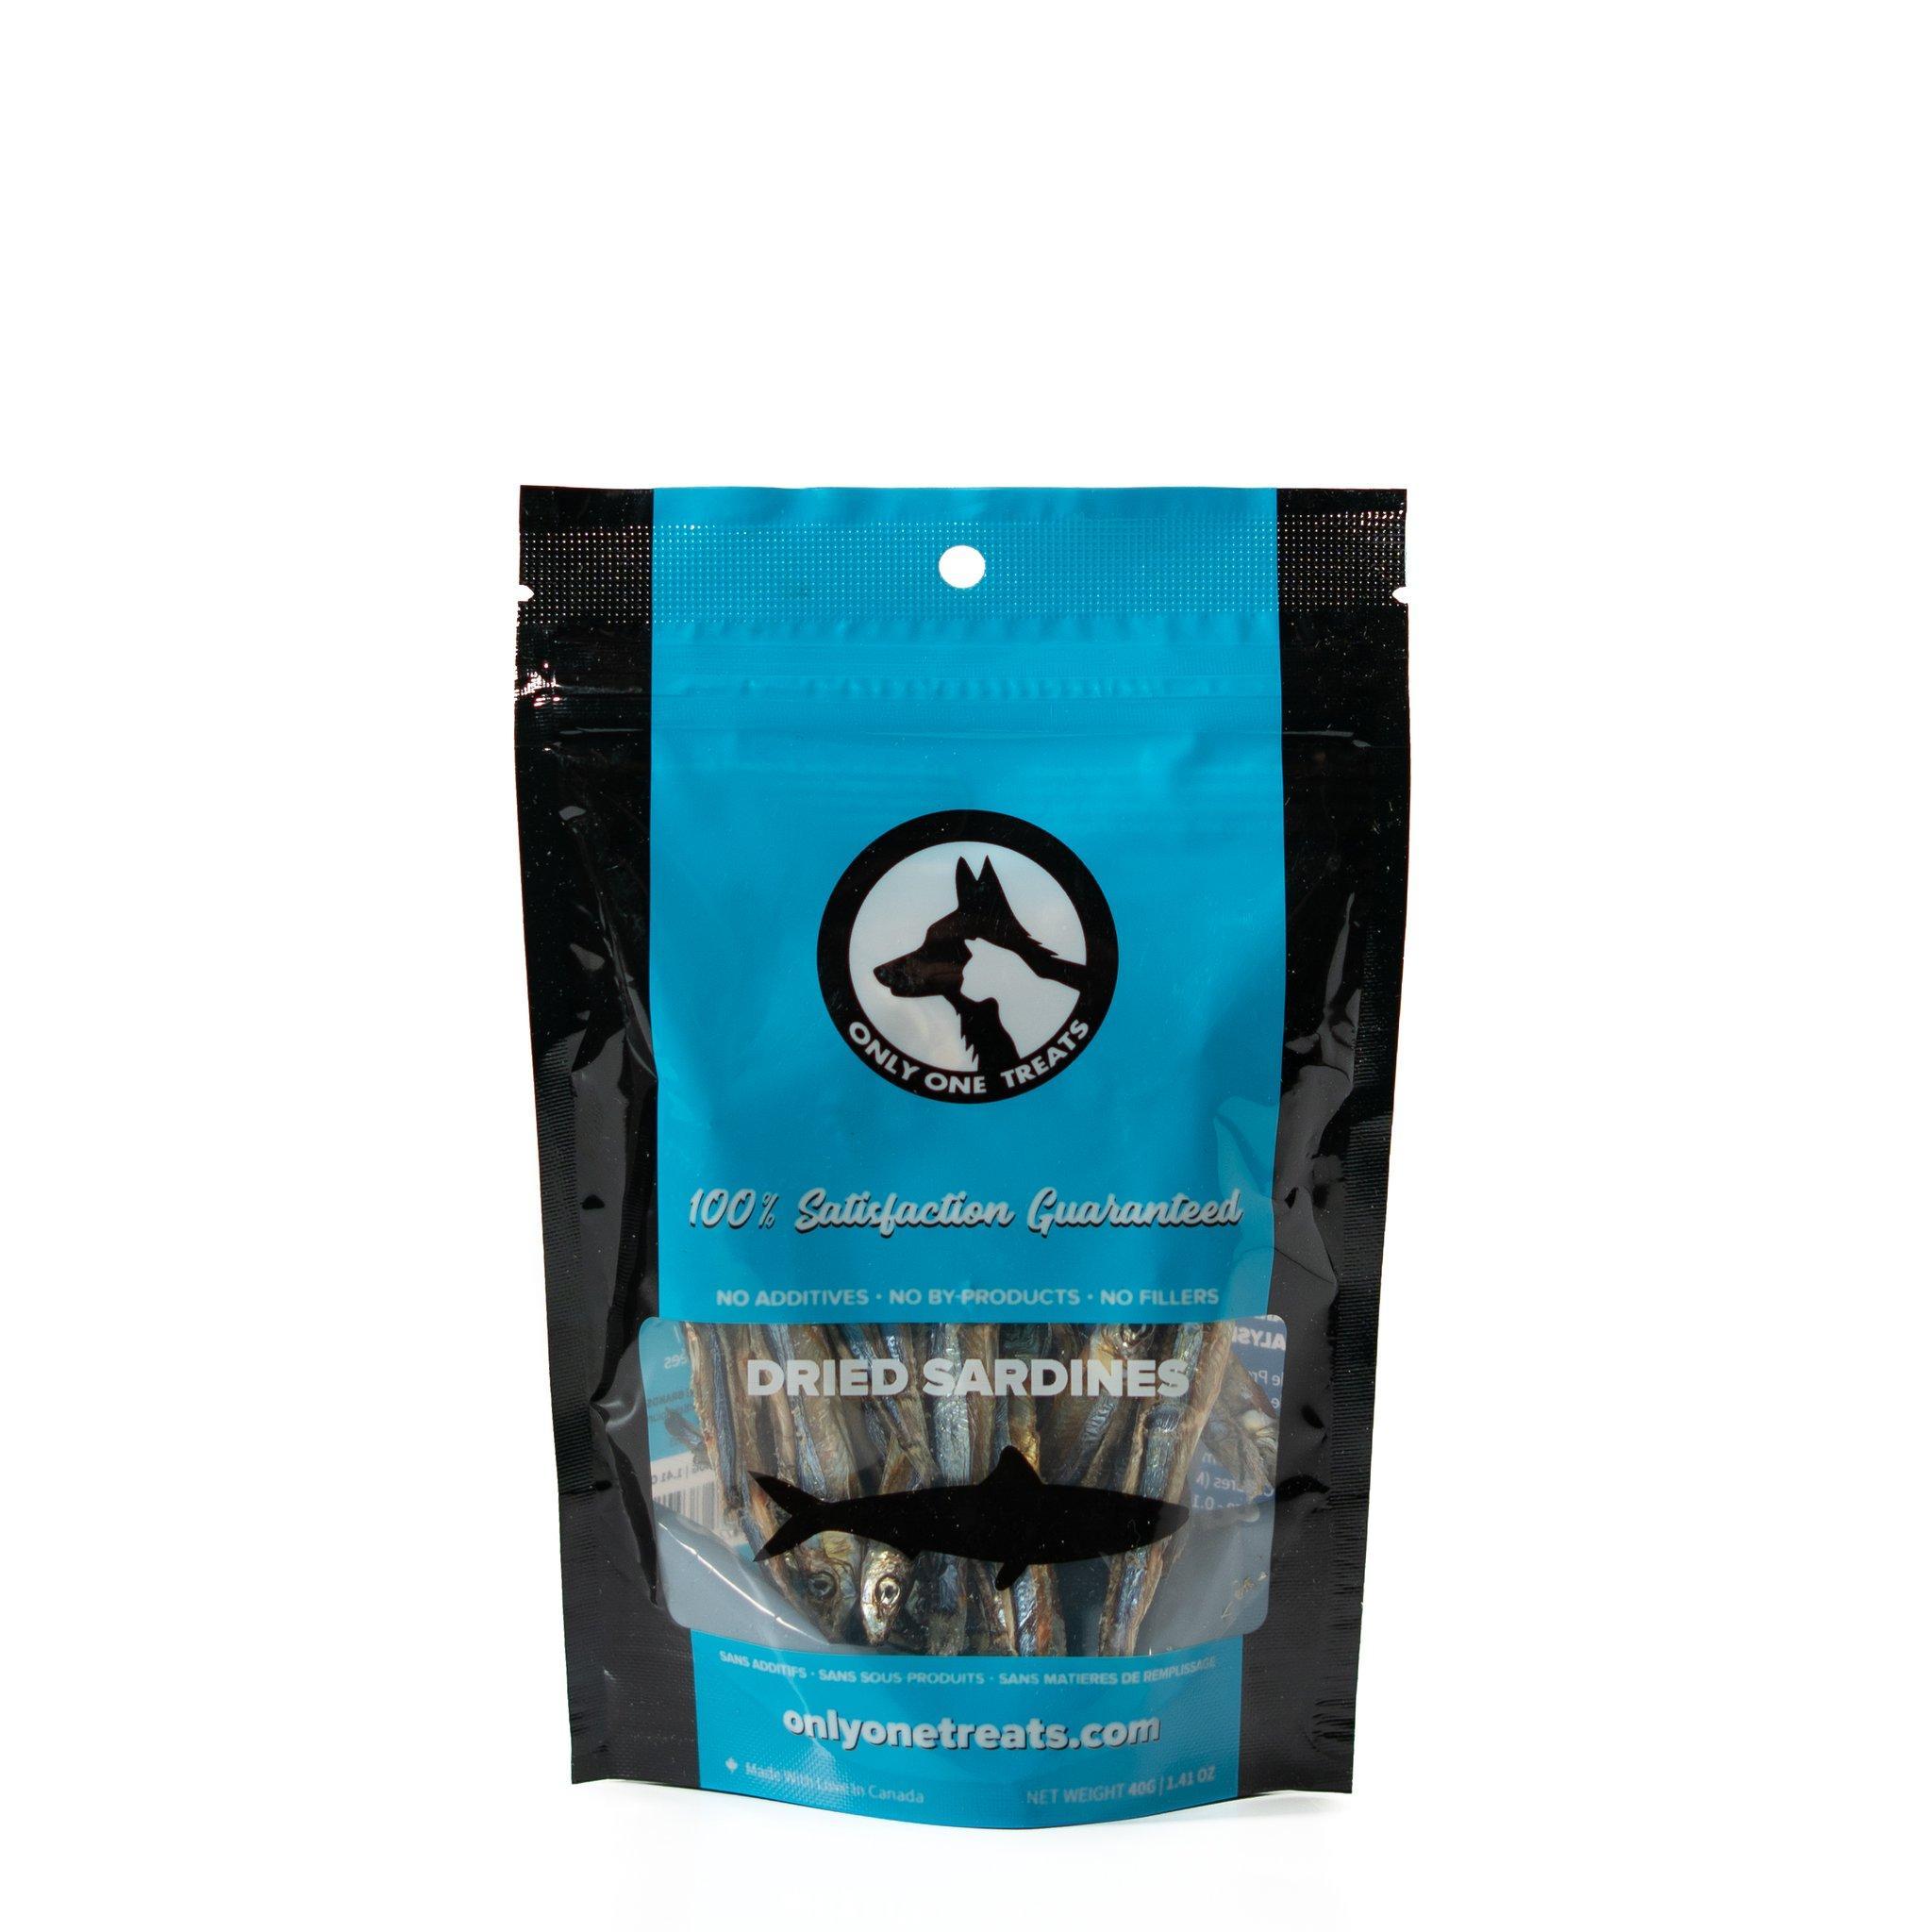 Only One Treats Dried Sardines Dog & Cat Treats, 40-gram